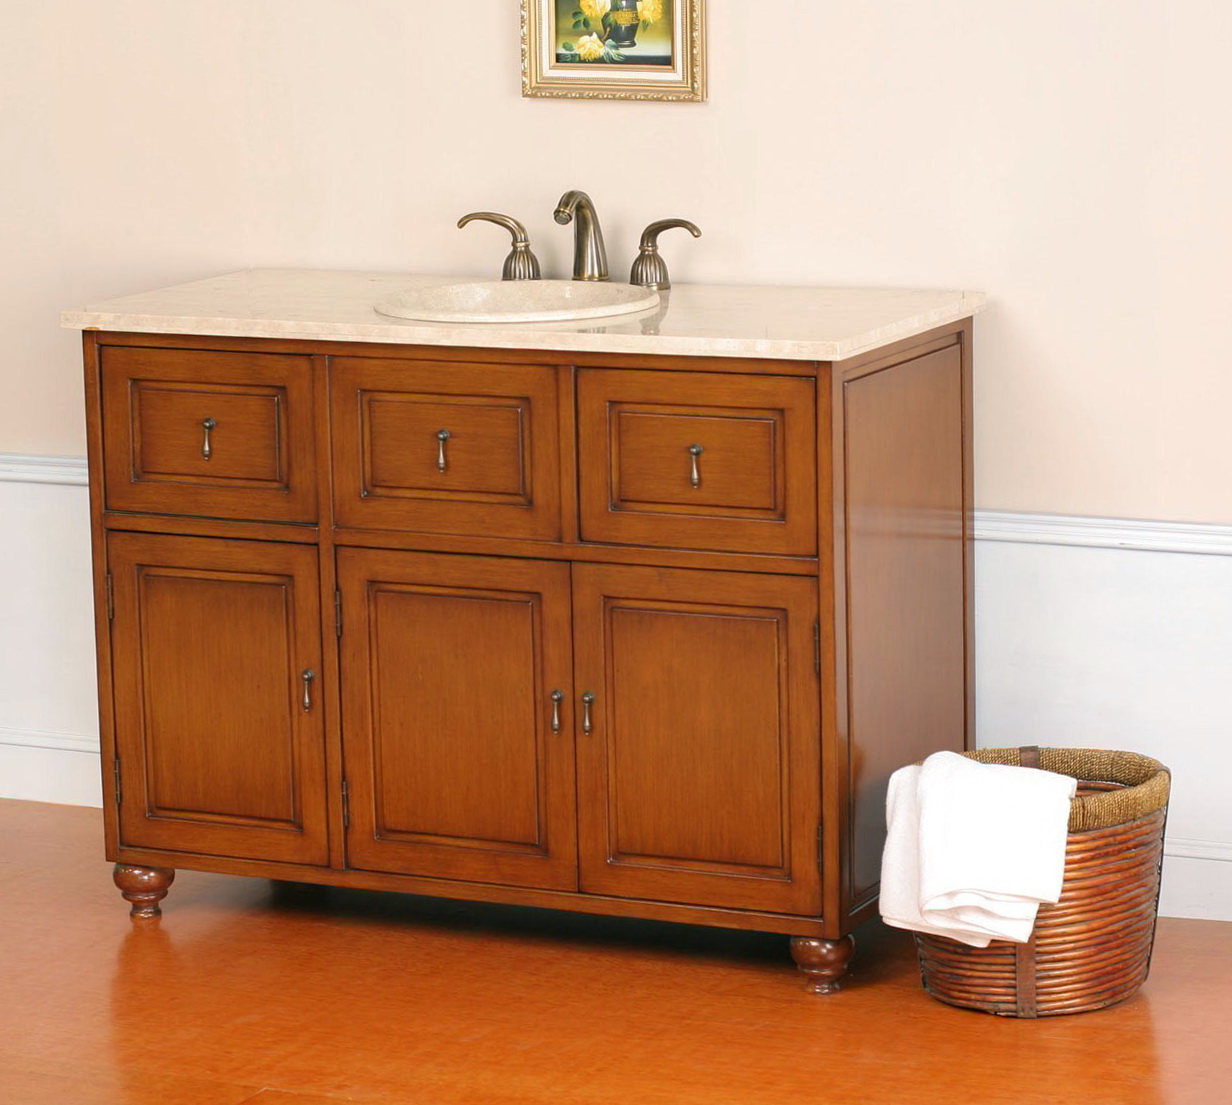 Inch Bathroom Vanity Light Home Design Ideas - 48 inch bathroom vanity light